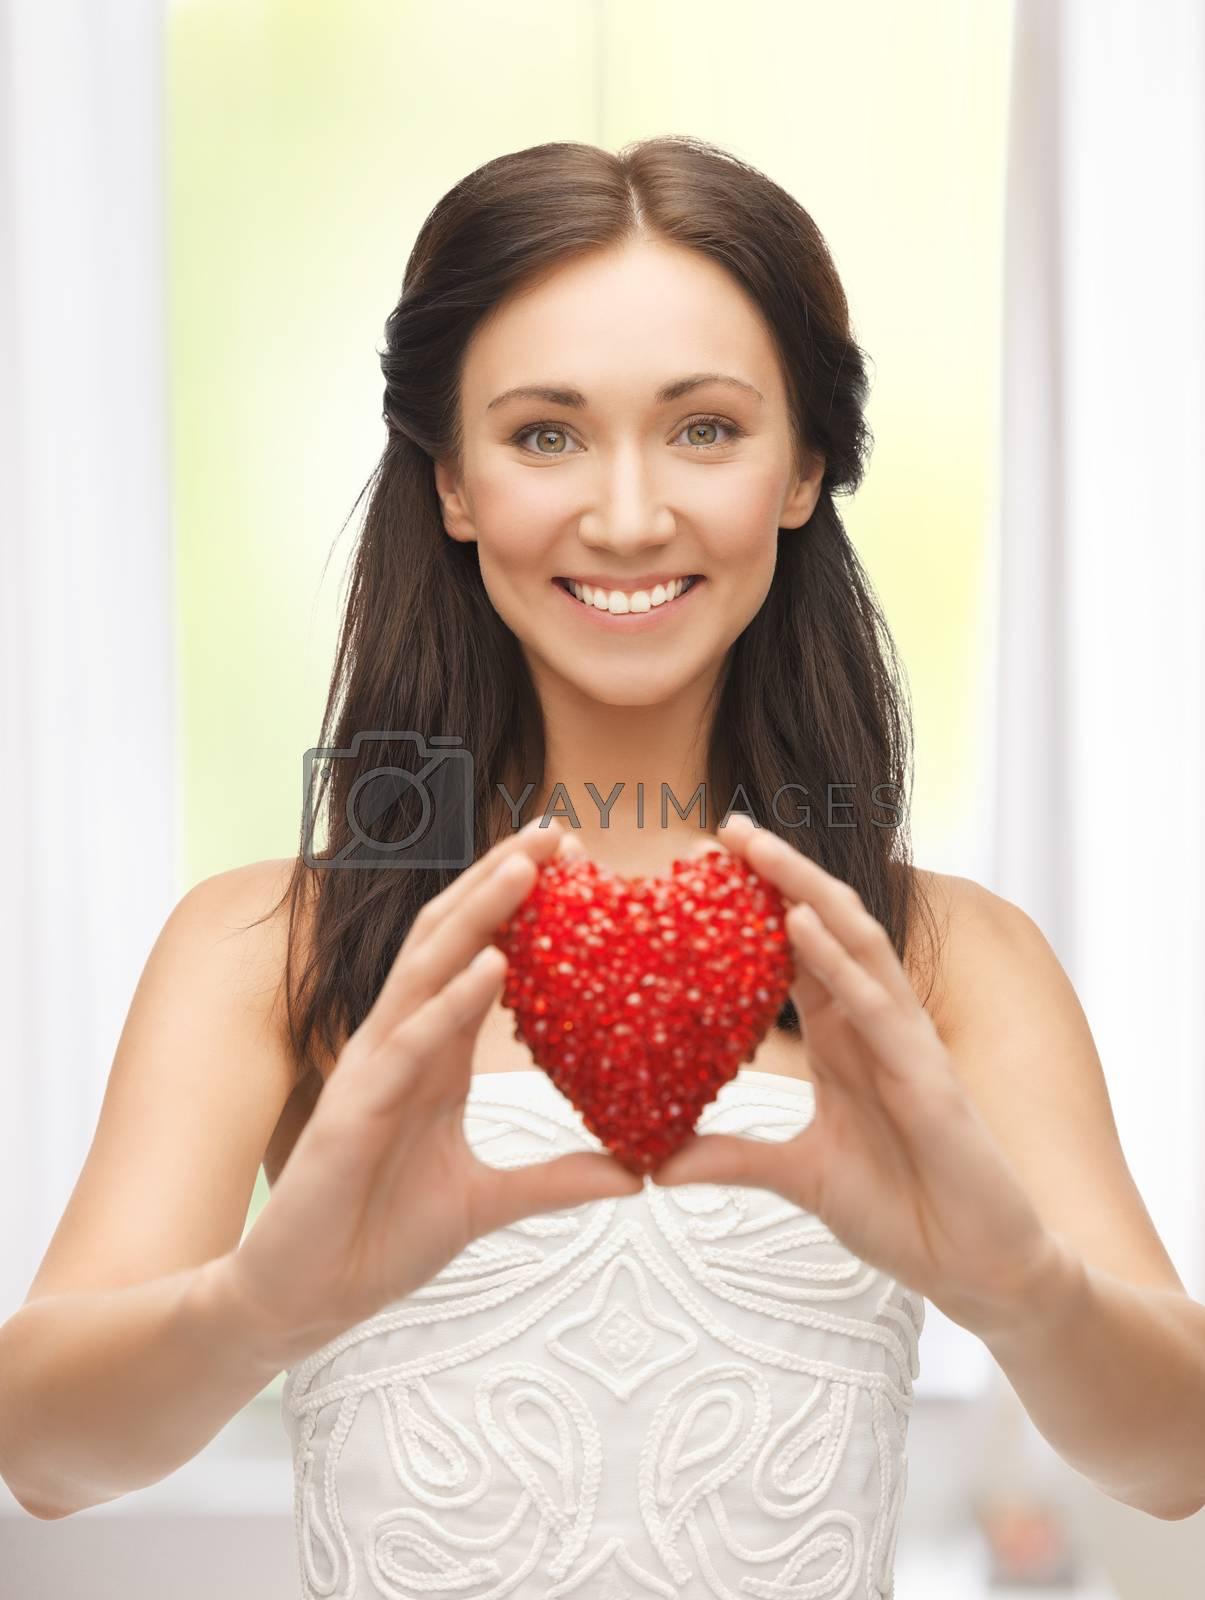 woman showing heart shape by dolgachov